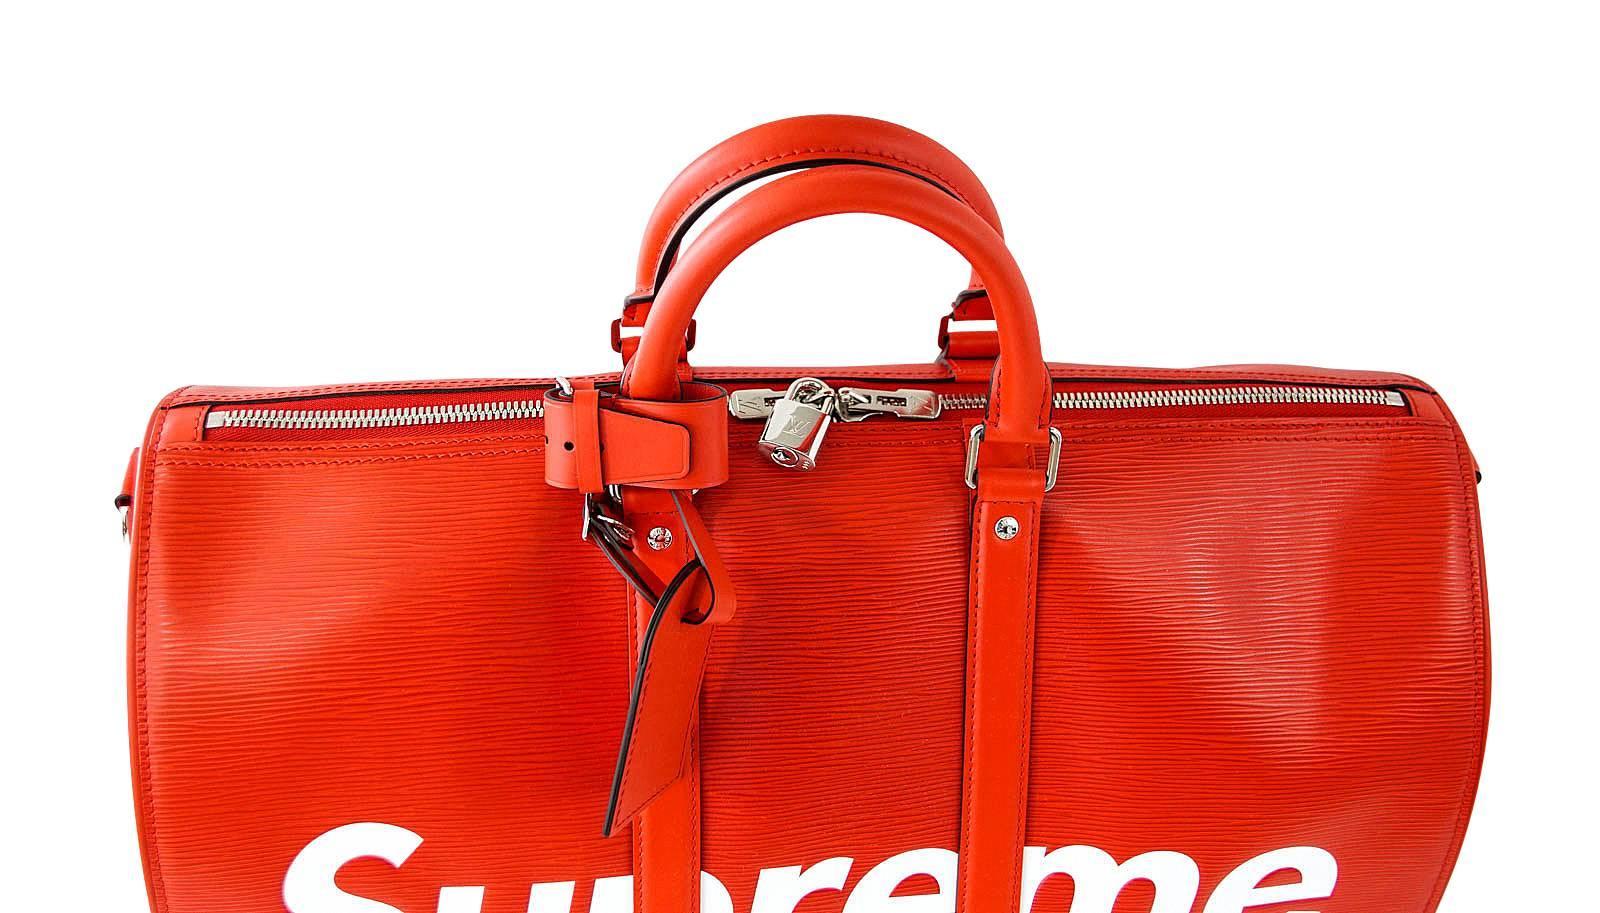 70513f3db Supreme Shopping Bag Price